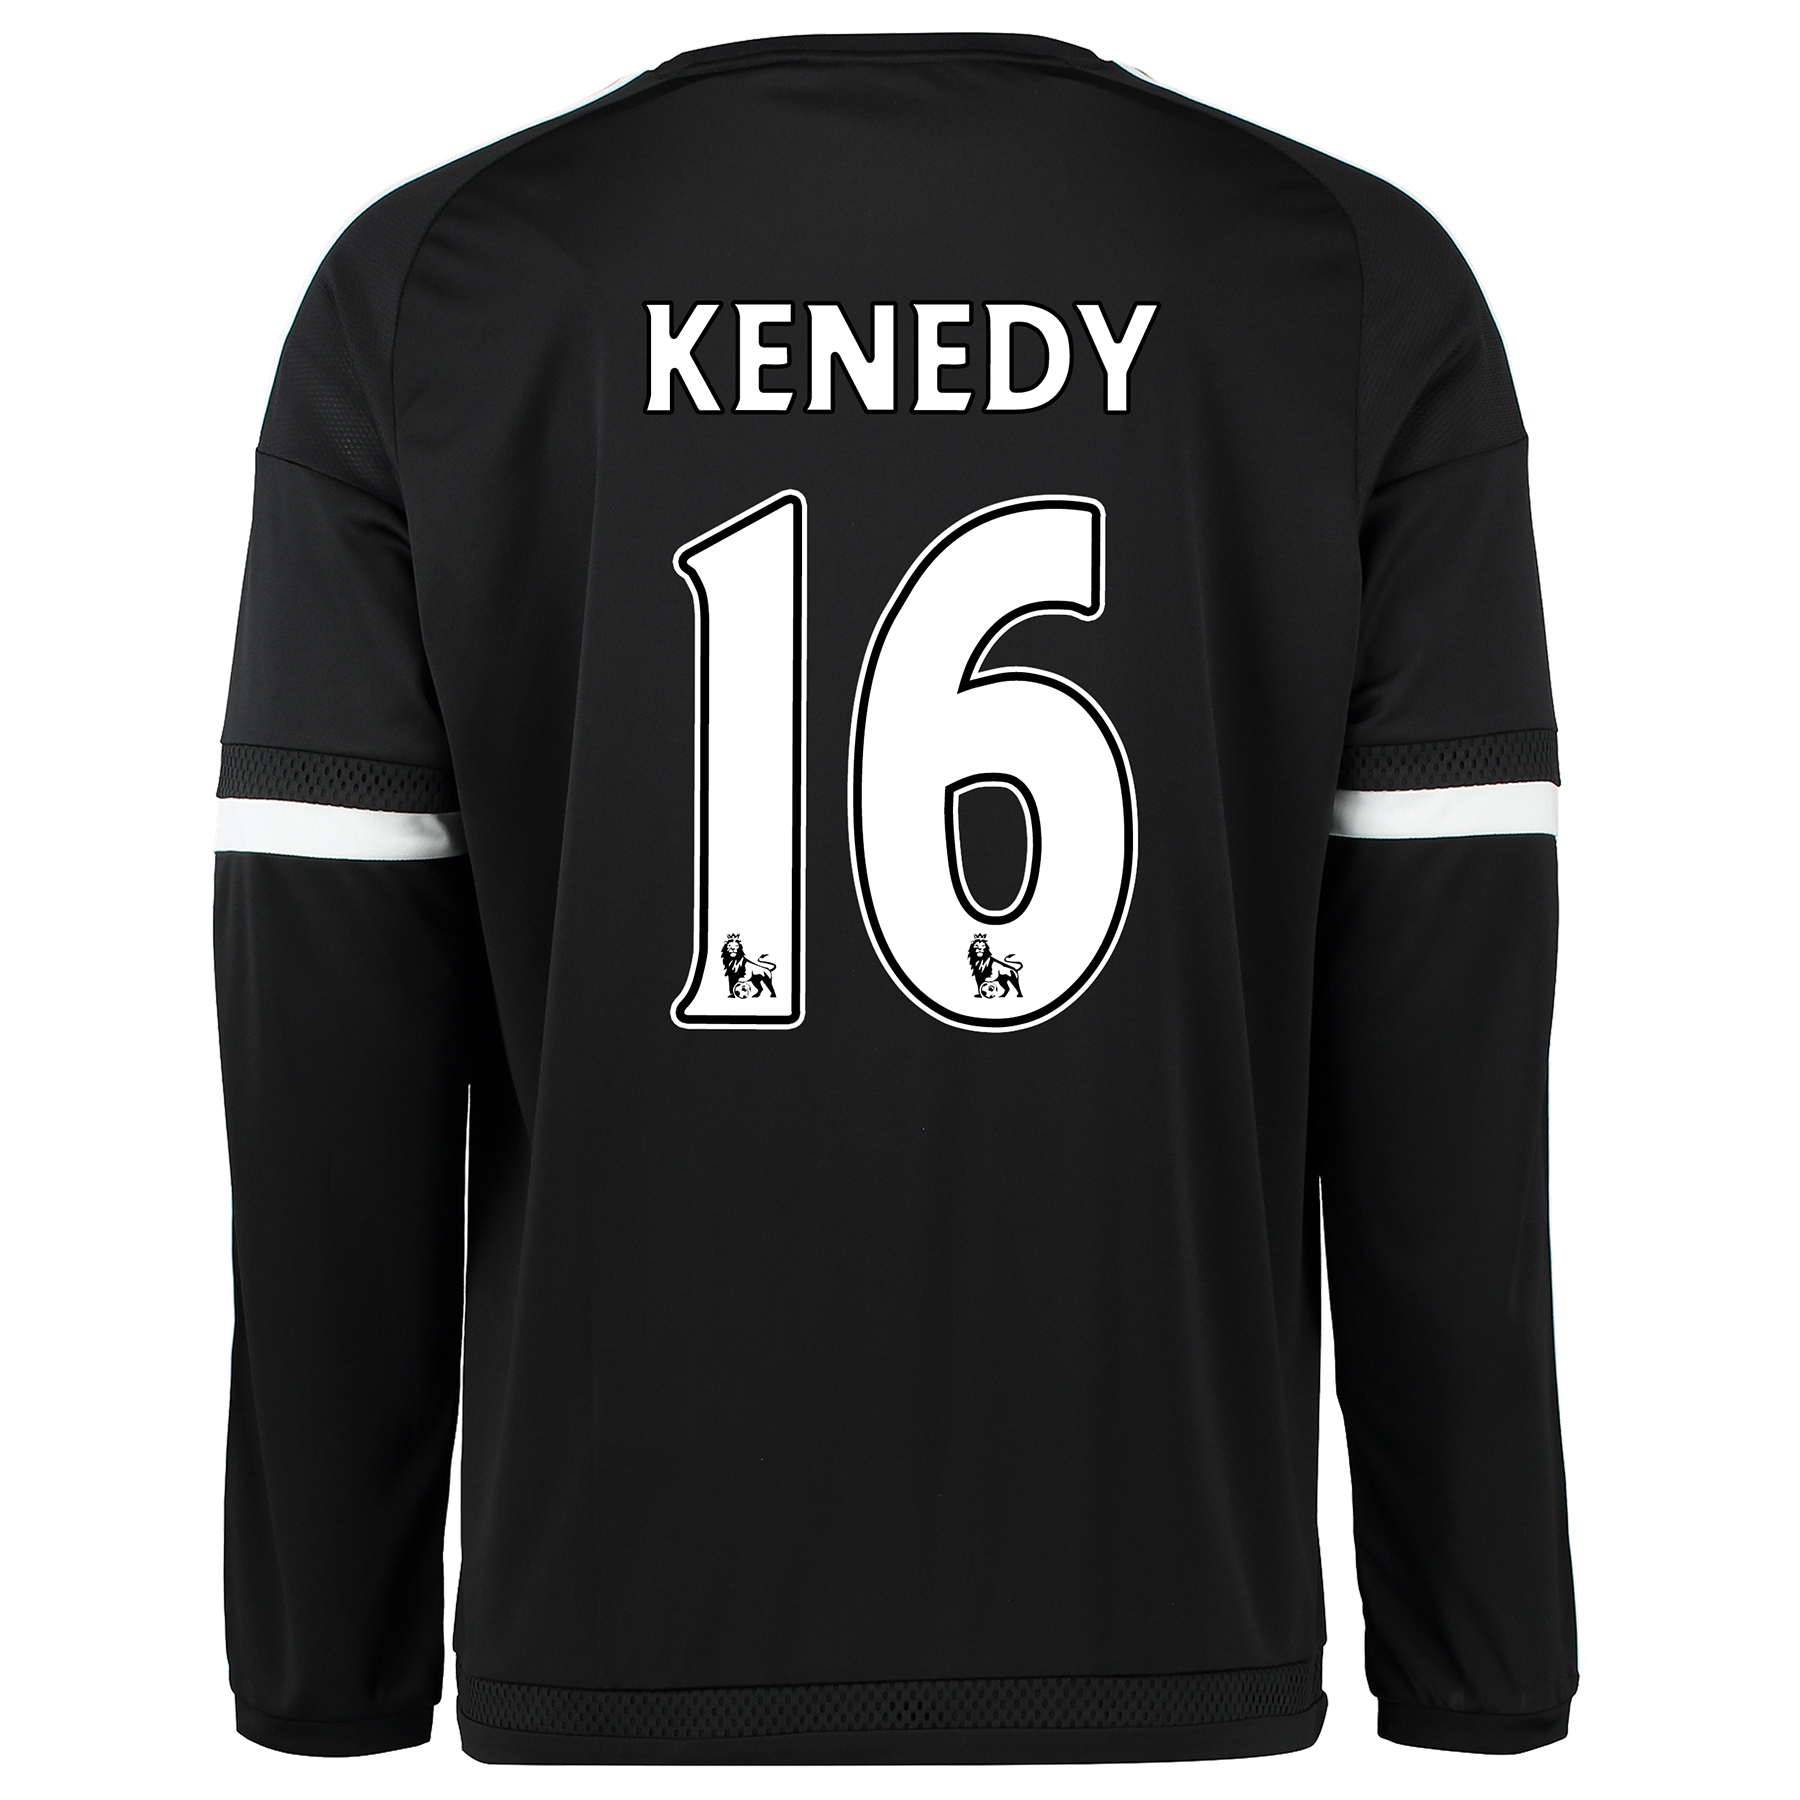 Chelsea Third Shirt 2015/16 - Long Sleeve Black with Kenedy 16 printin